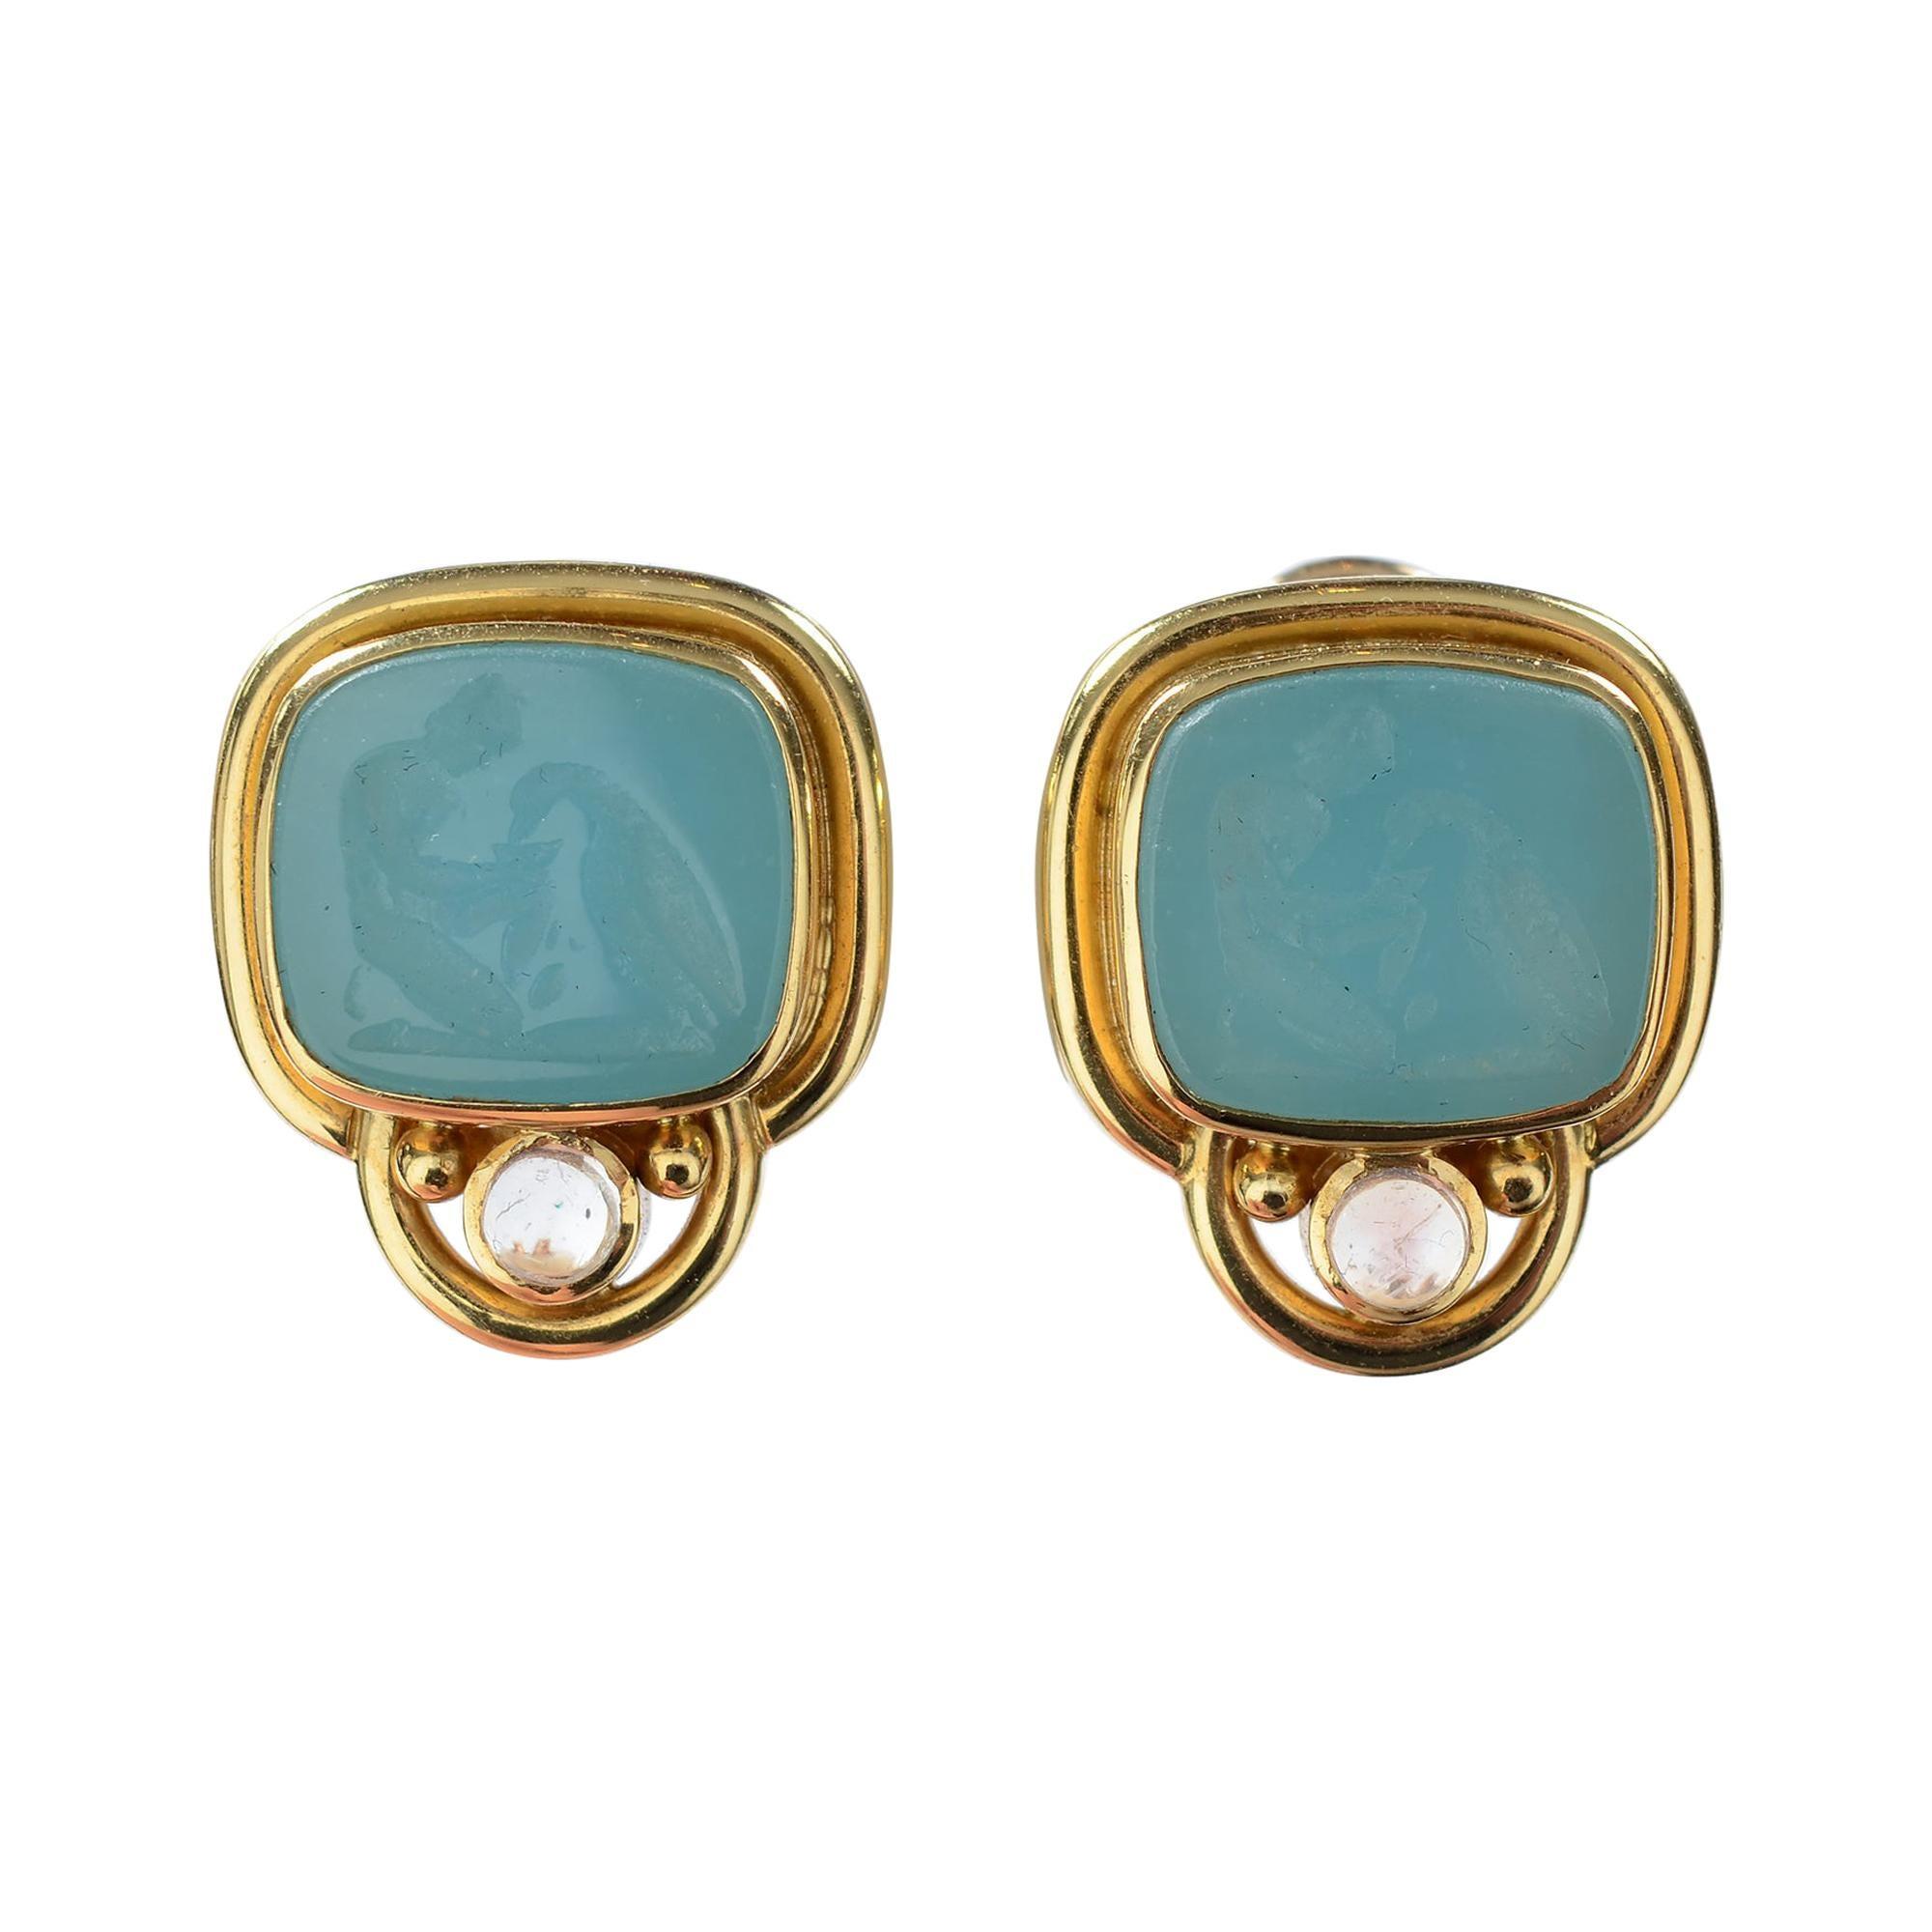 Elizabeth Locke Intaglio and Moonstone Earrings